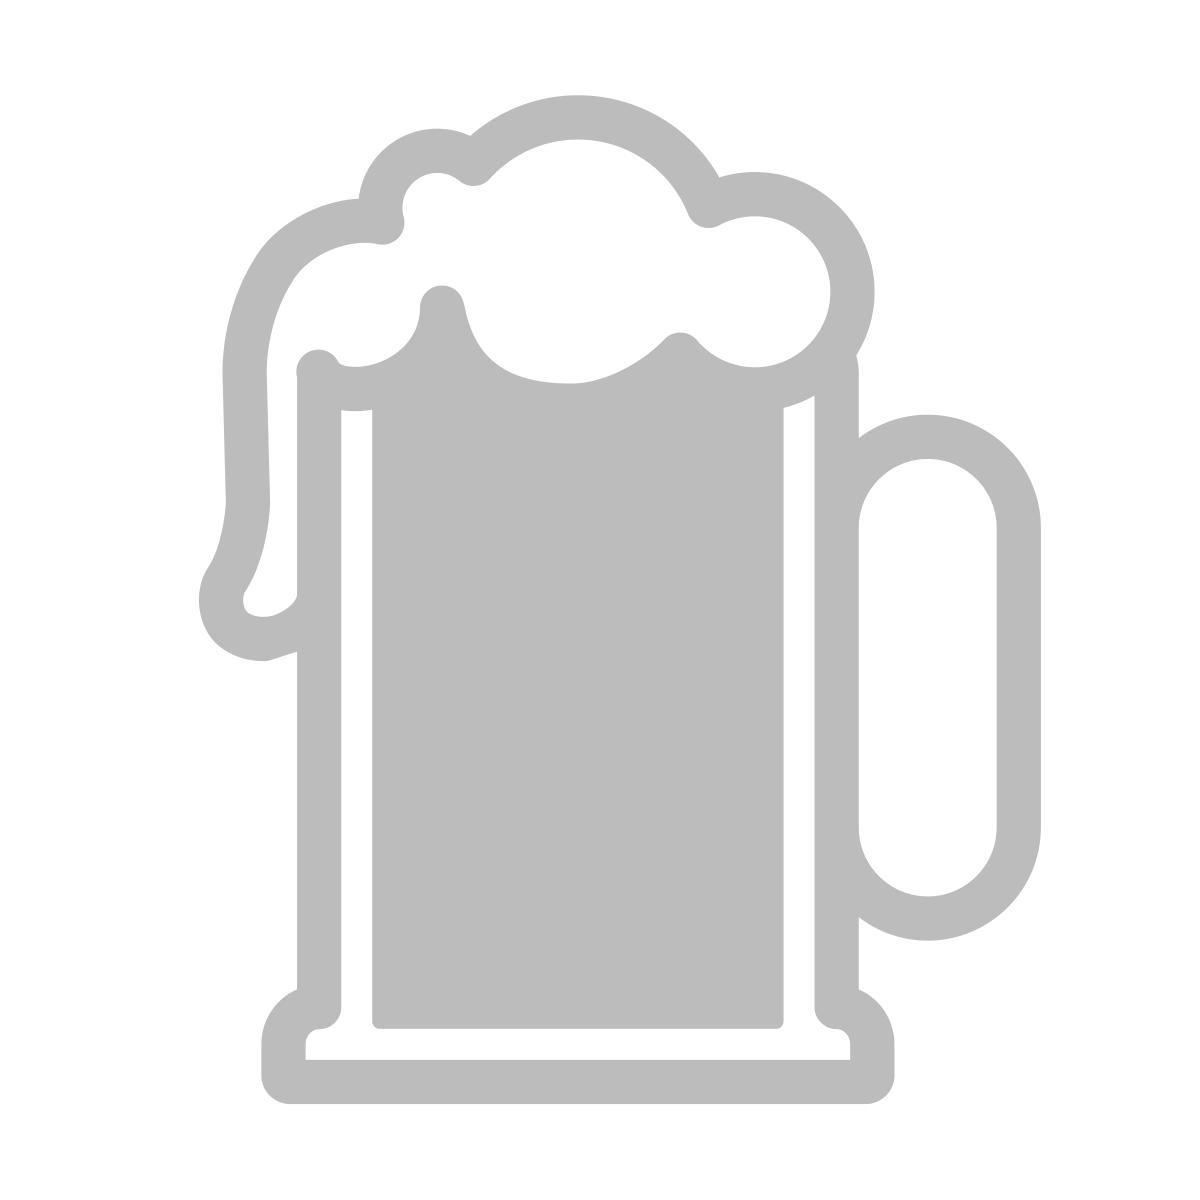 beverage service icon